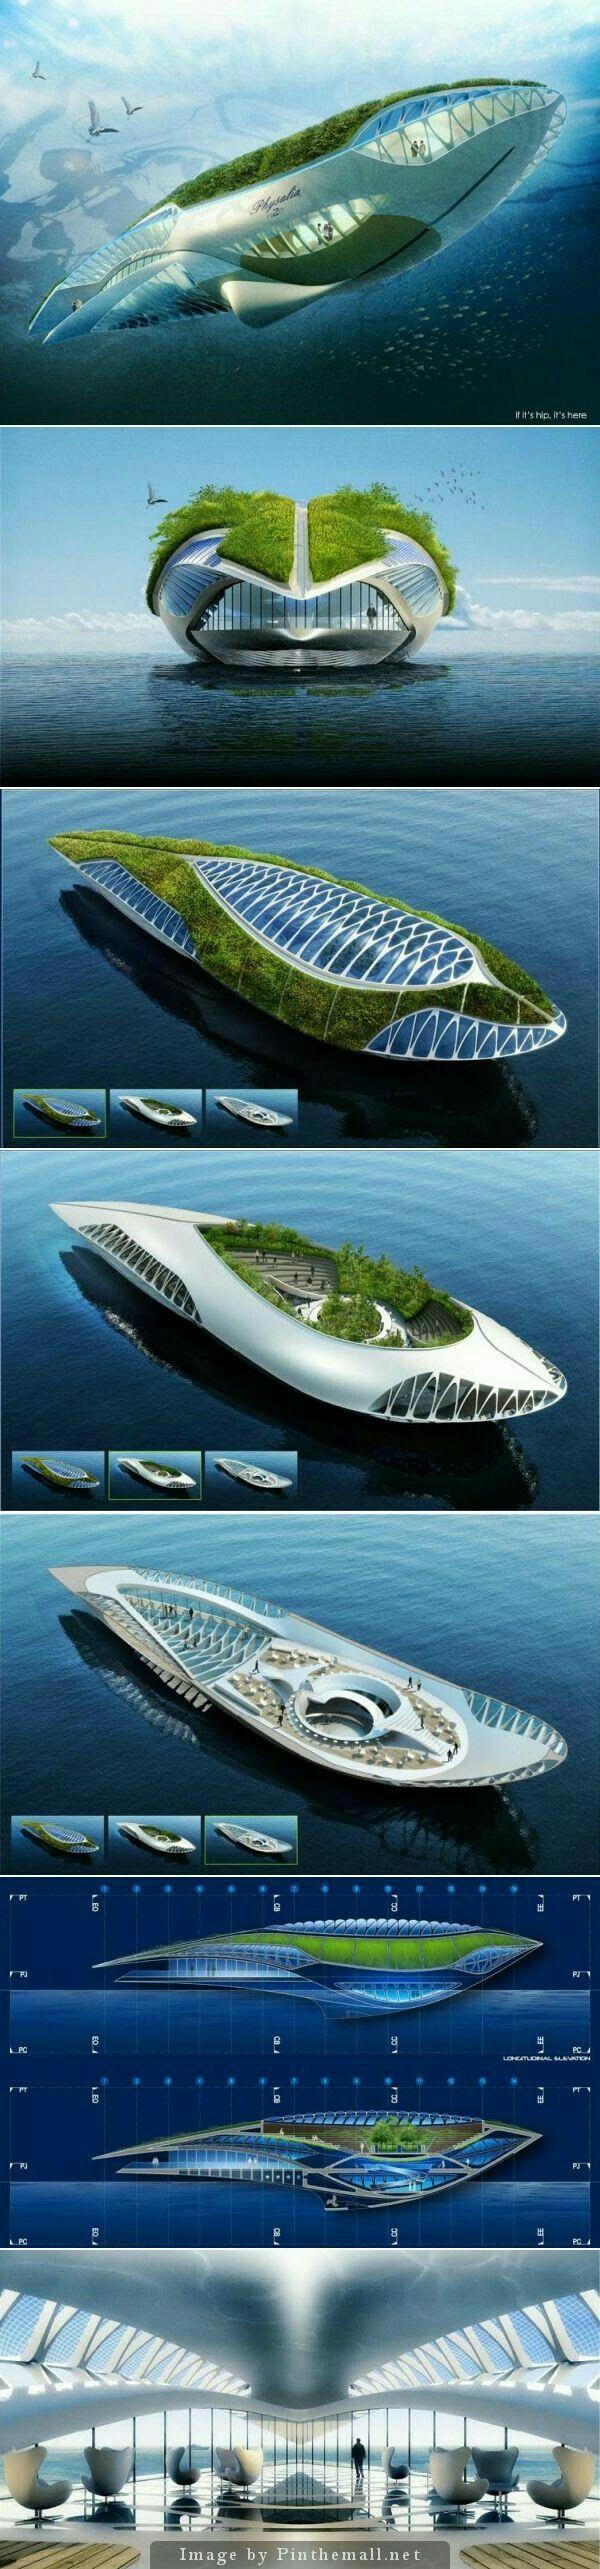 An Amphibious Floating Garden That Purifies The Water, The Physalia.